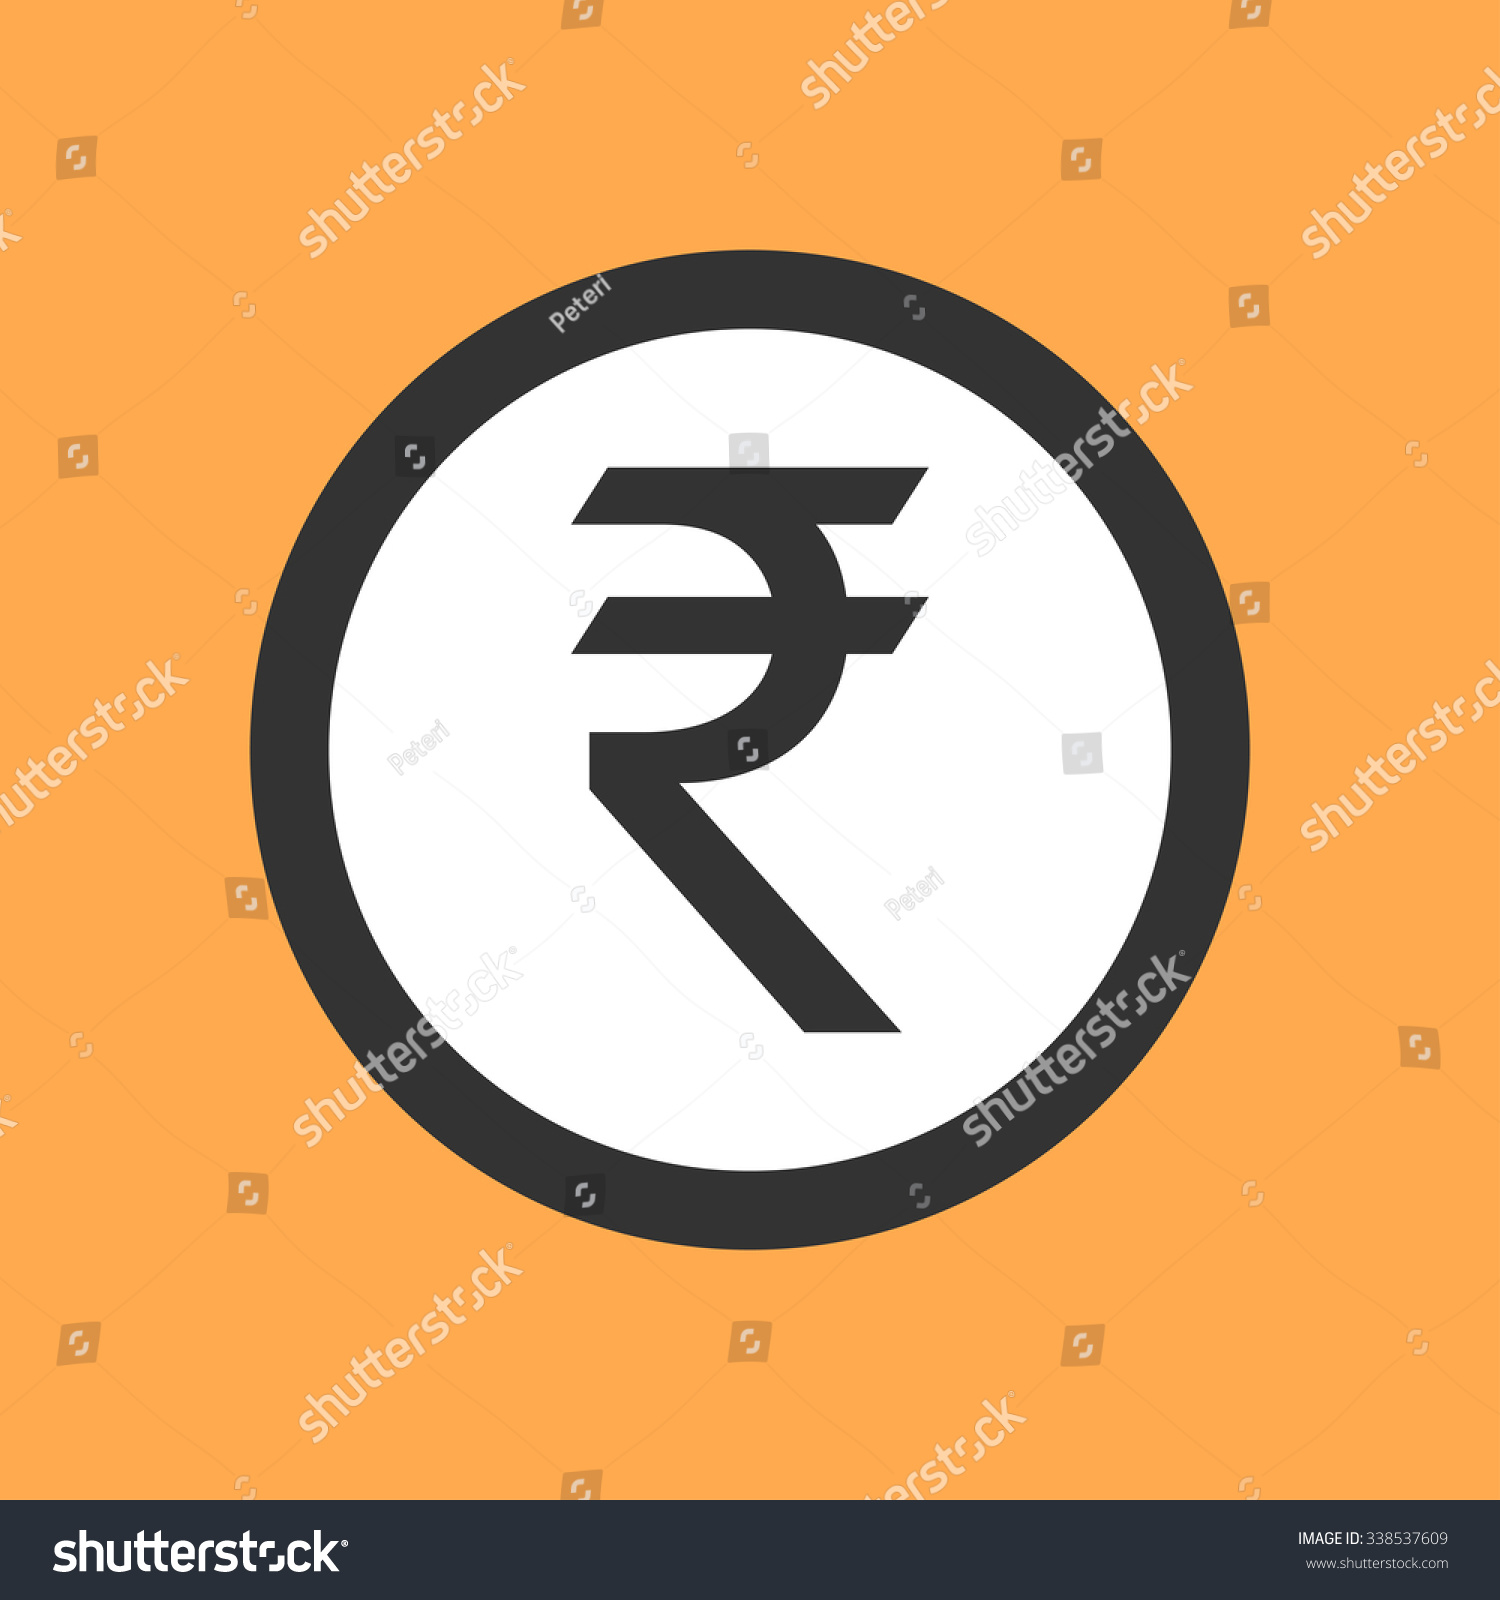 Indian rupee symbol flat design stock vector 338537609 shutterstock indian rupee symbol in flat design buycottarizona